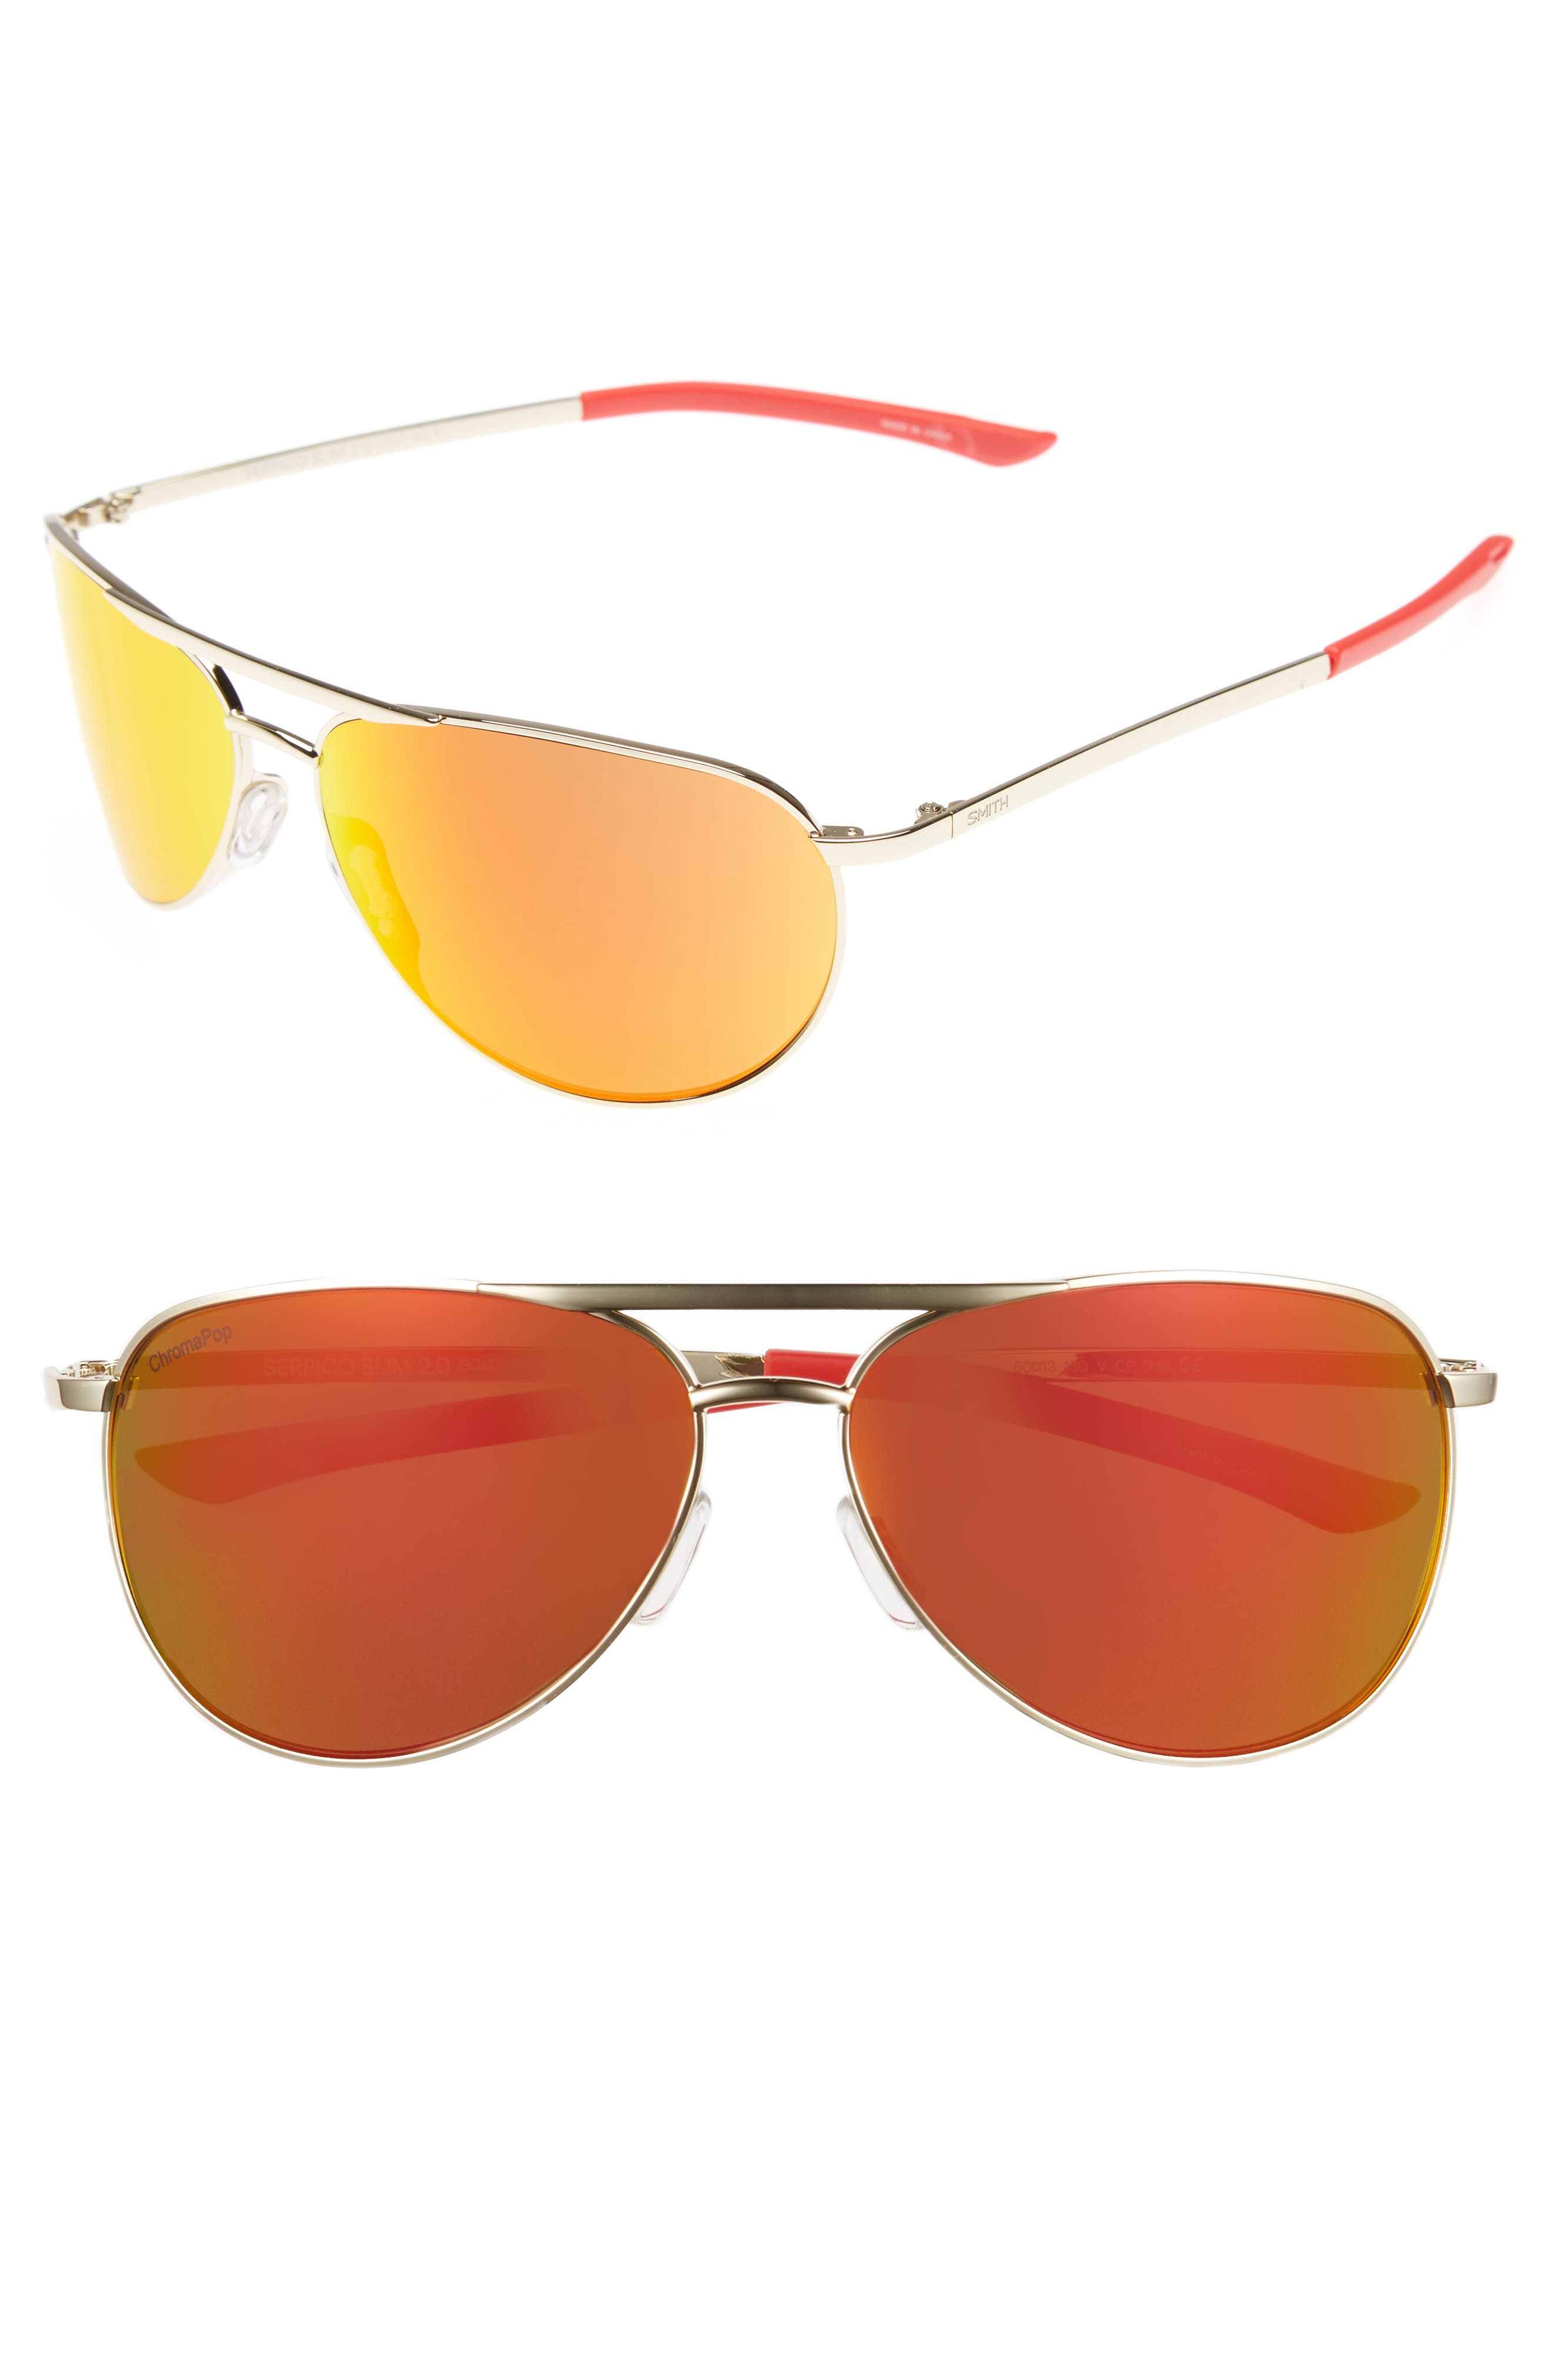 Serpico Slim 2.0 60mm ChromaPop Polarized Aviator Sunglasses,                             Main thumbnail 1, color,                             710